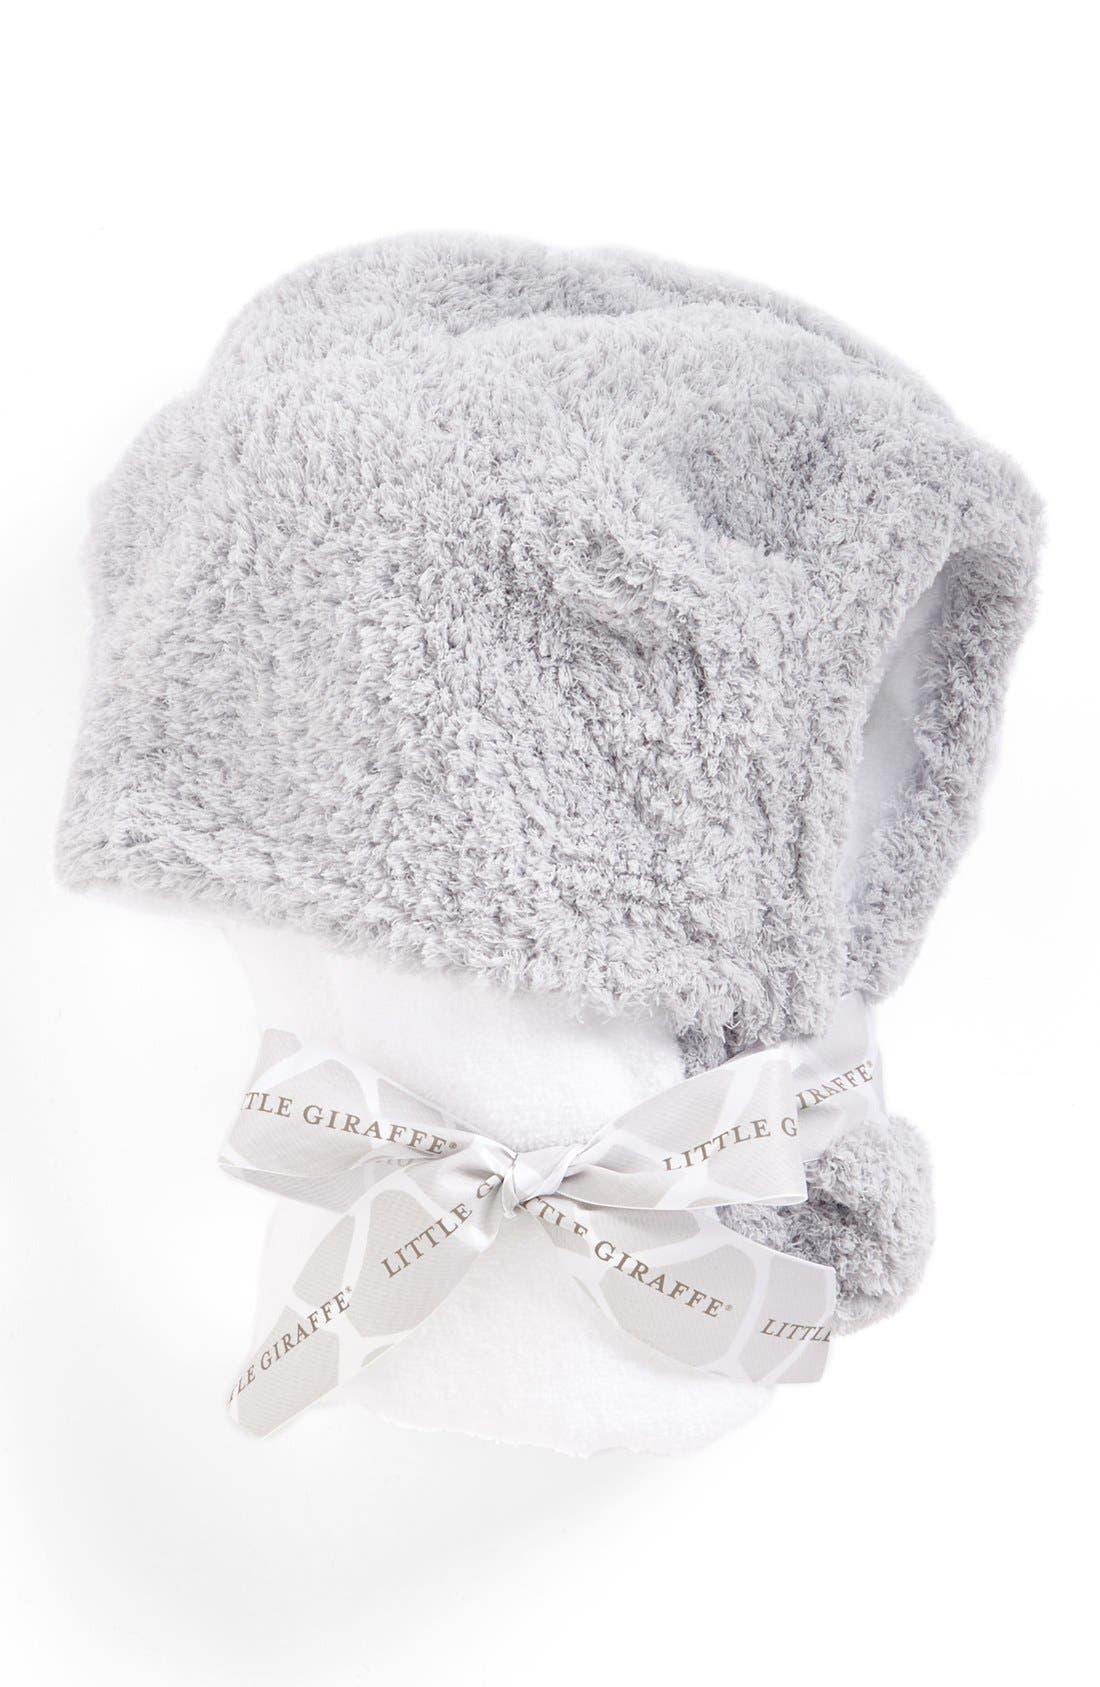 Main Image - Little Giraffe Chenille Hooded Towel (Baby)